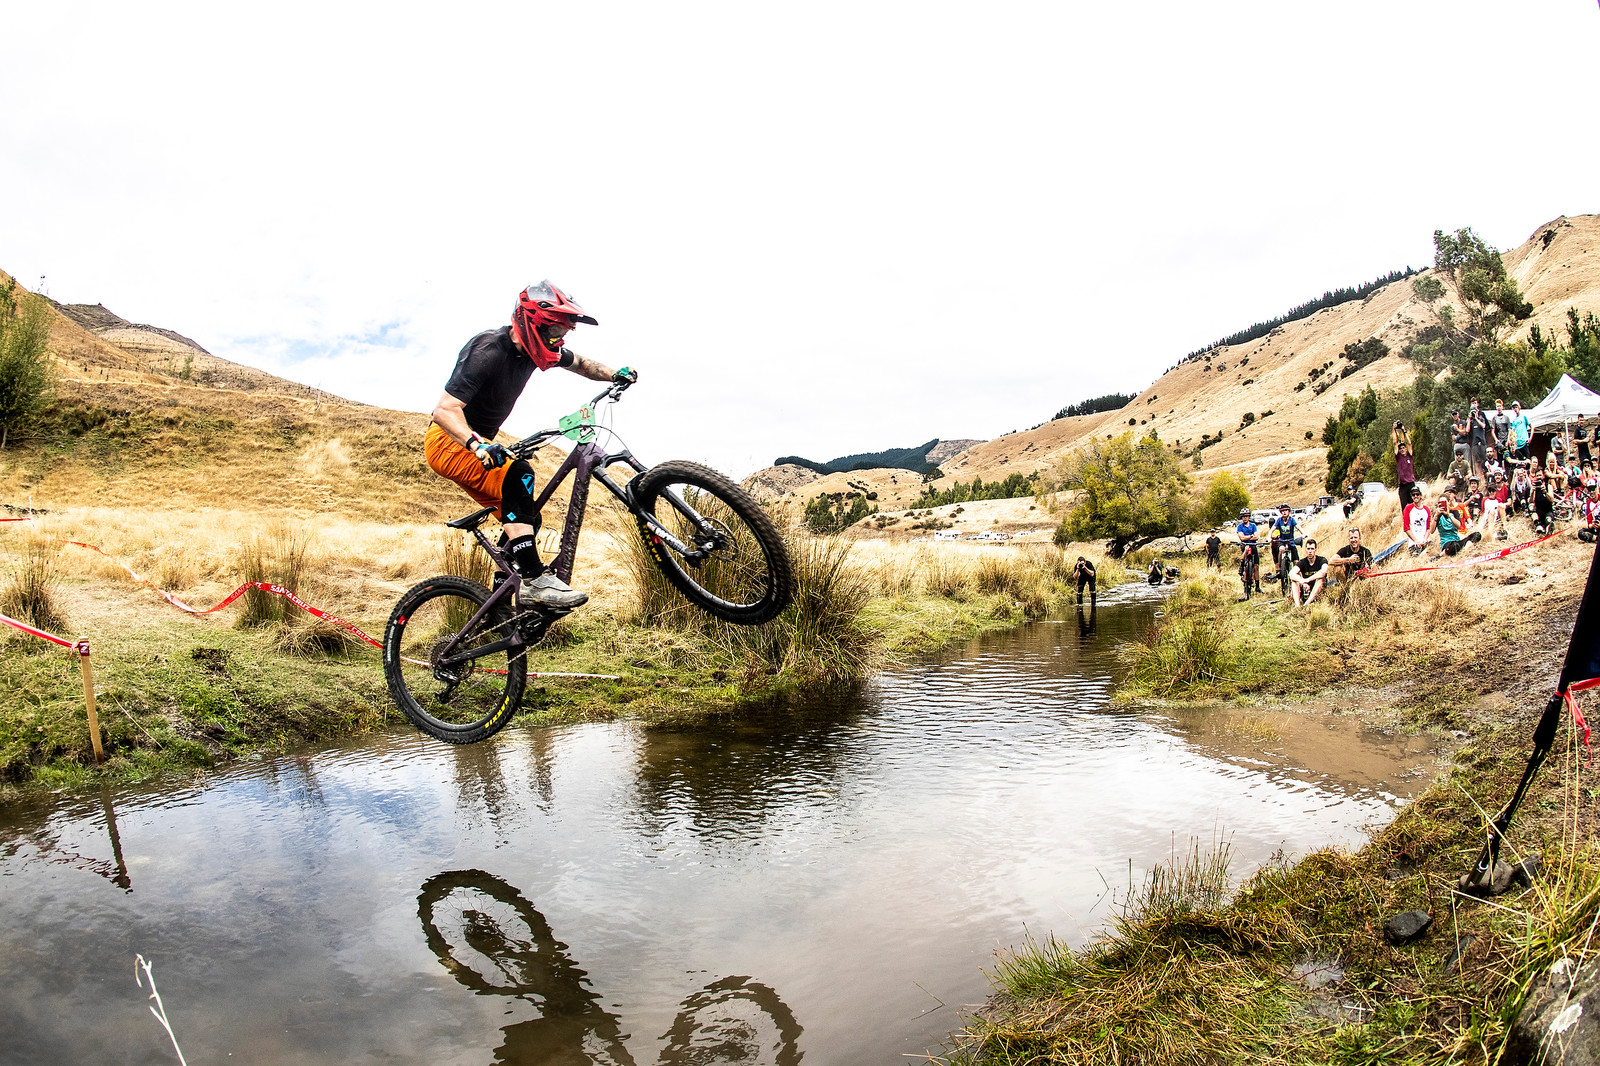 NZEnduro19  m1 9812 - 2019 NZ Enduro Day 3 Photo Gallery - Mountain Biking Pictures - Vital MTB